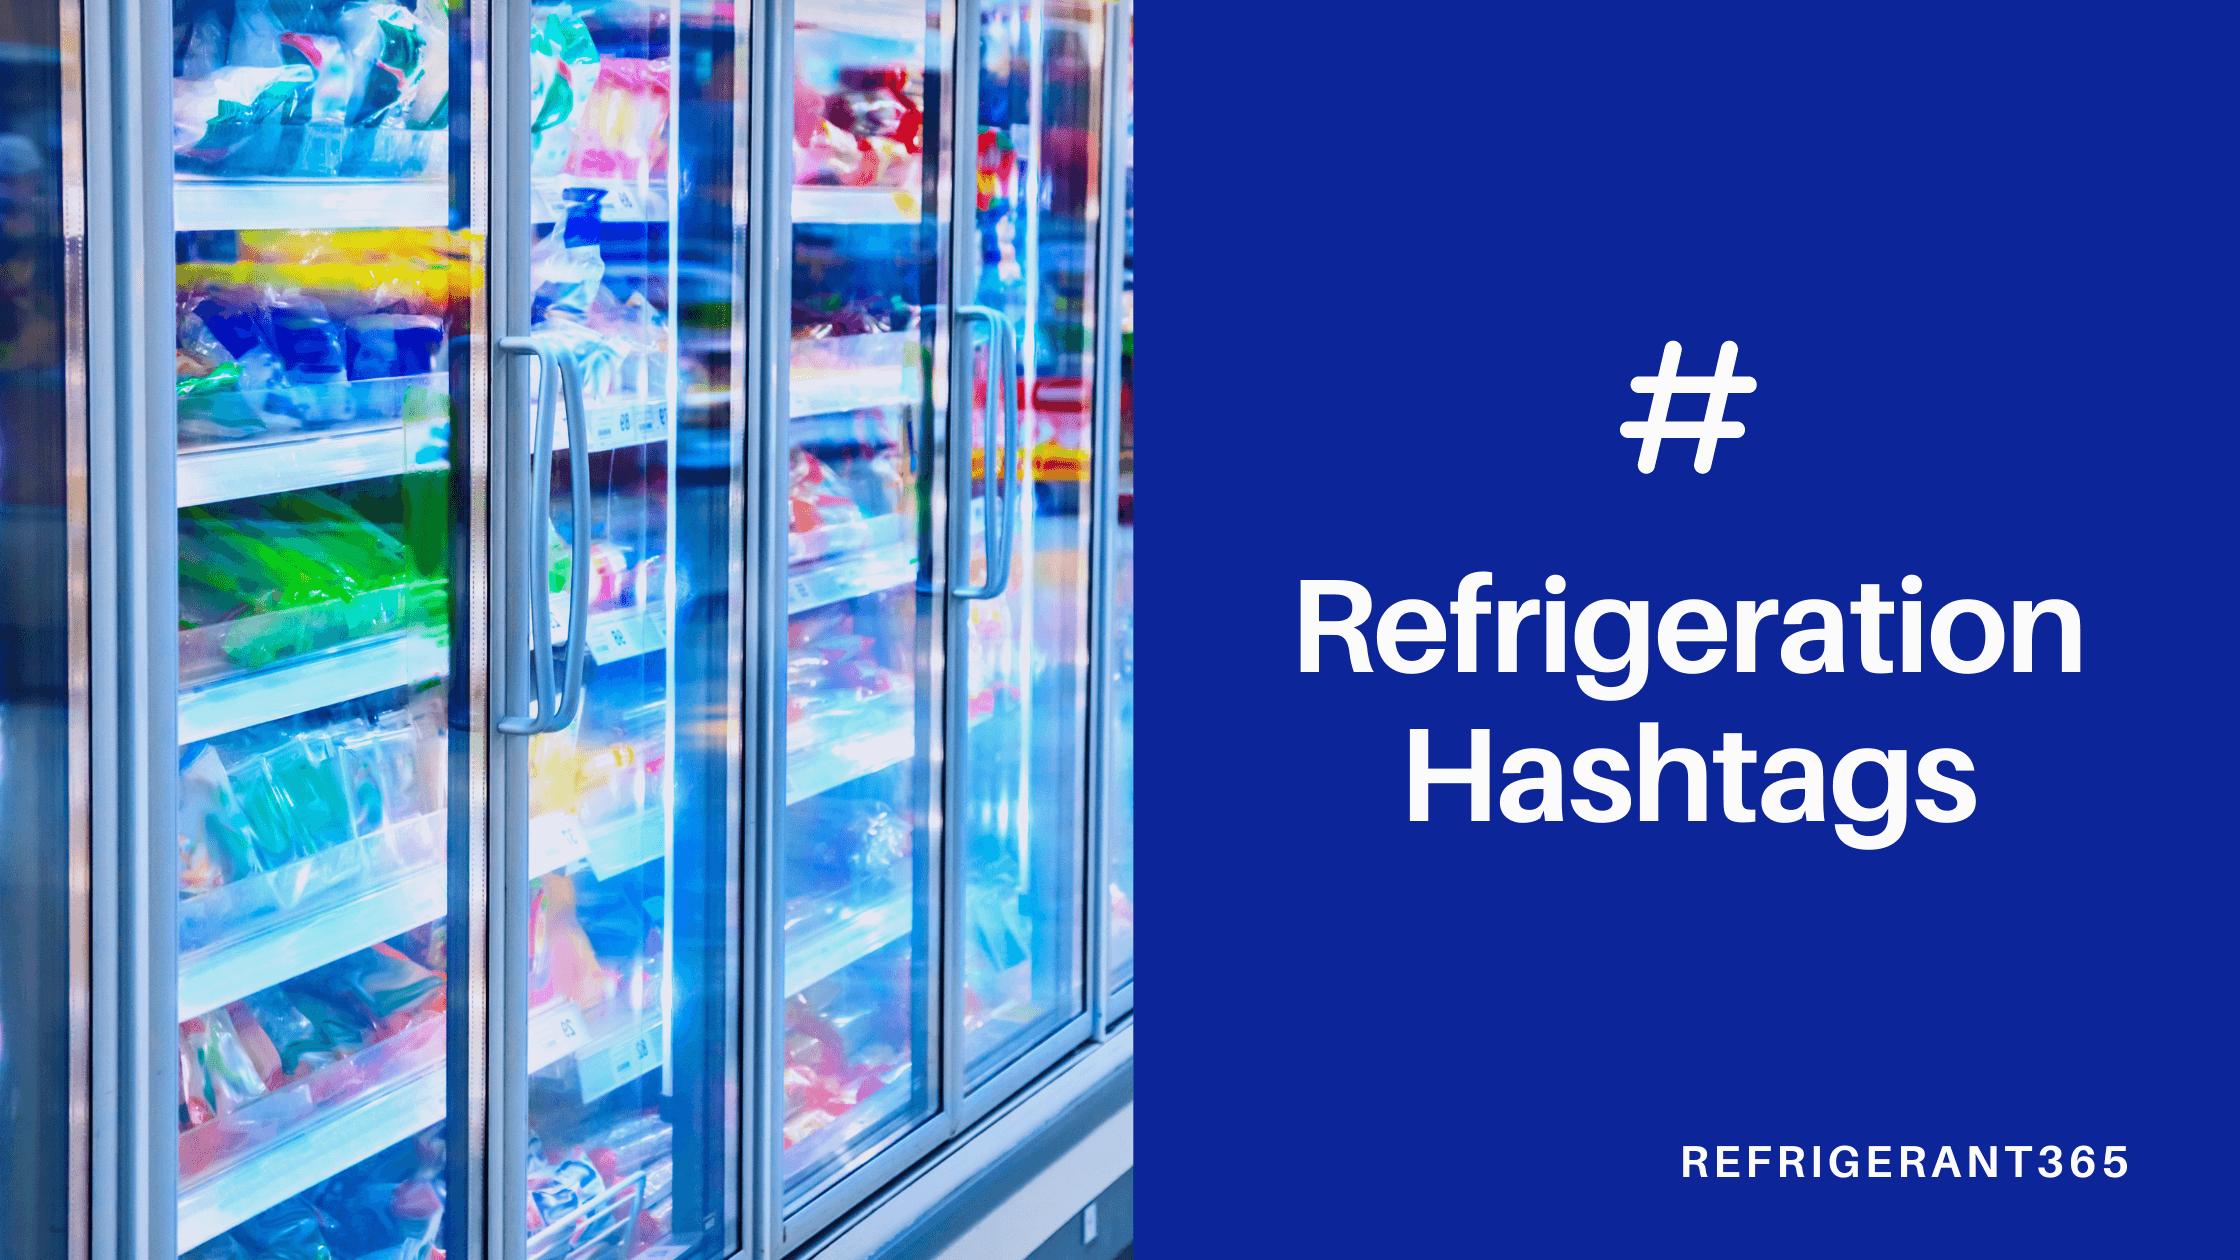 Refrigeration Hashtags